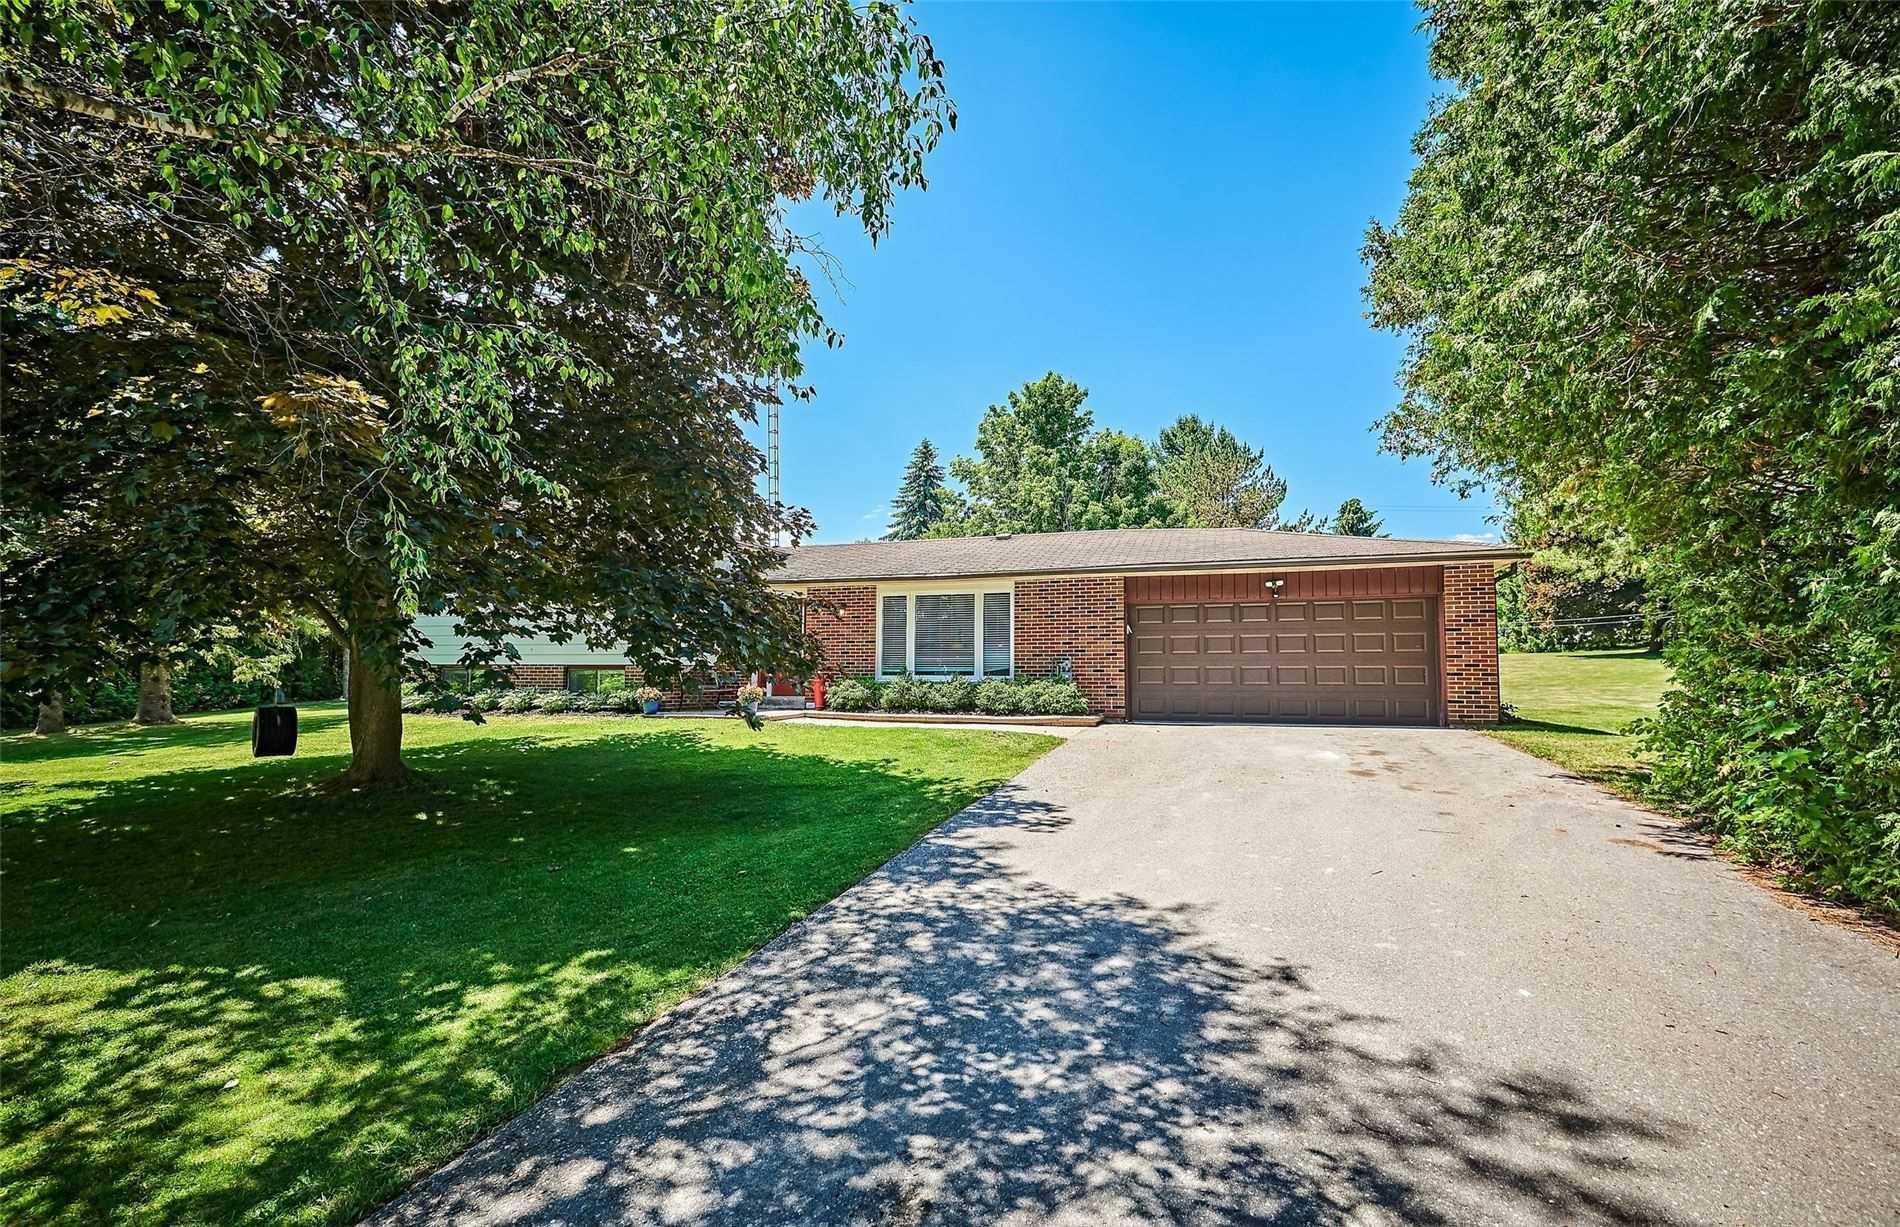 12 Robinglade Ave, Kawartha Lakes, Ontario L0C 1G0, 3 Bedrooms Bedrooms, ,2 BathroomsBathrooms,Detached,For Sale,Robinglade,X5272300